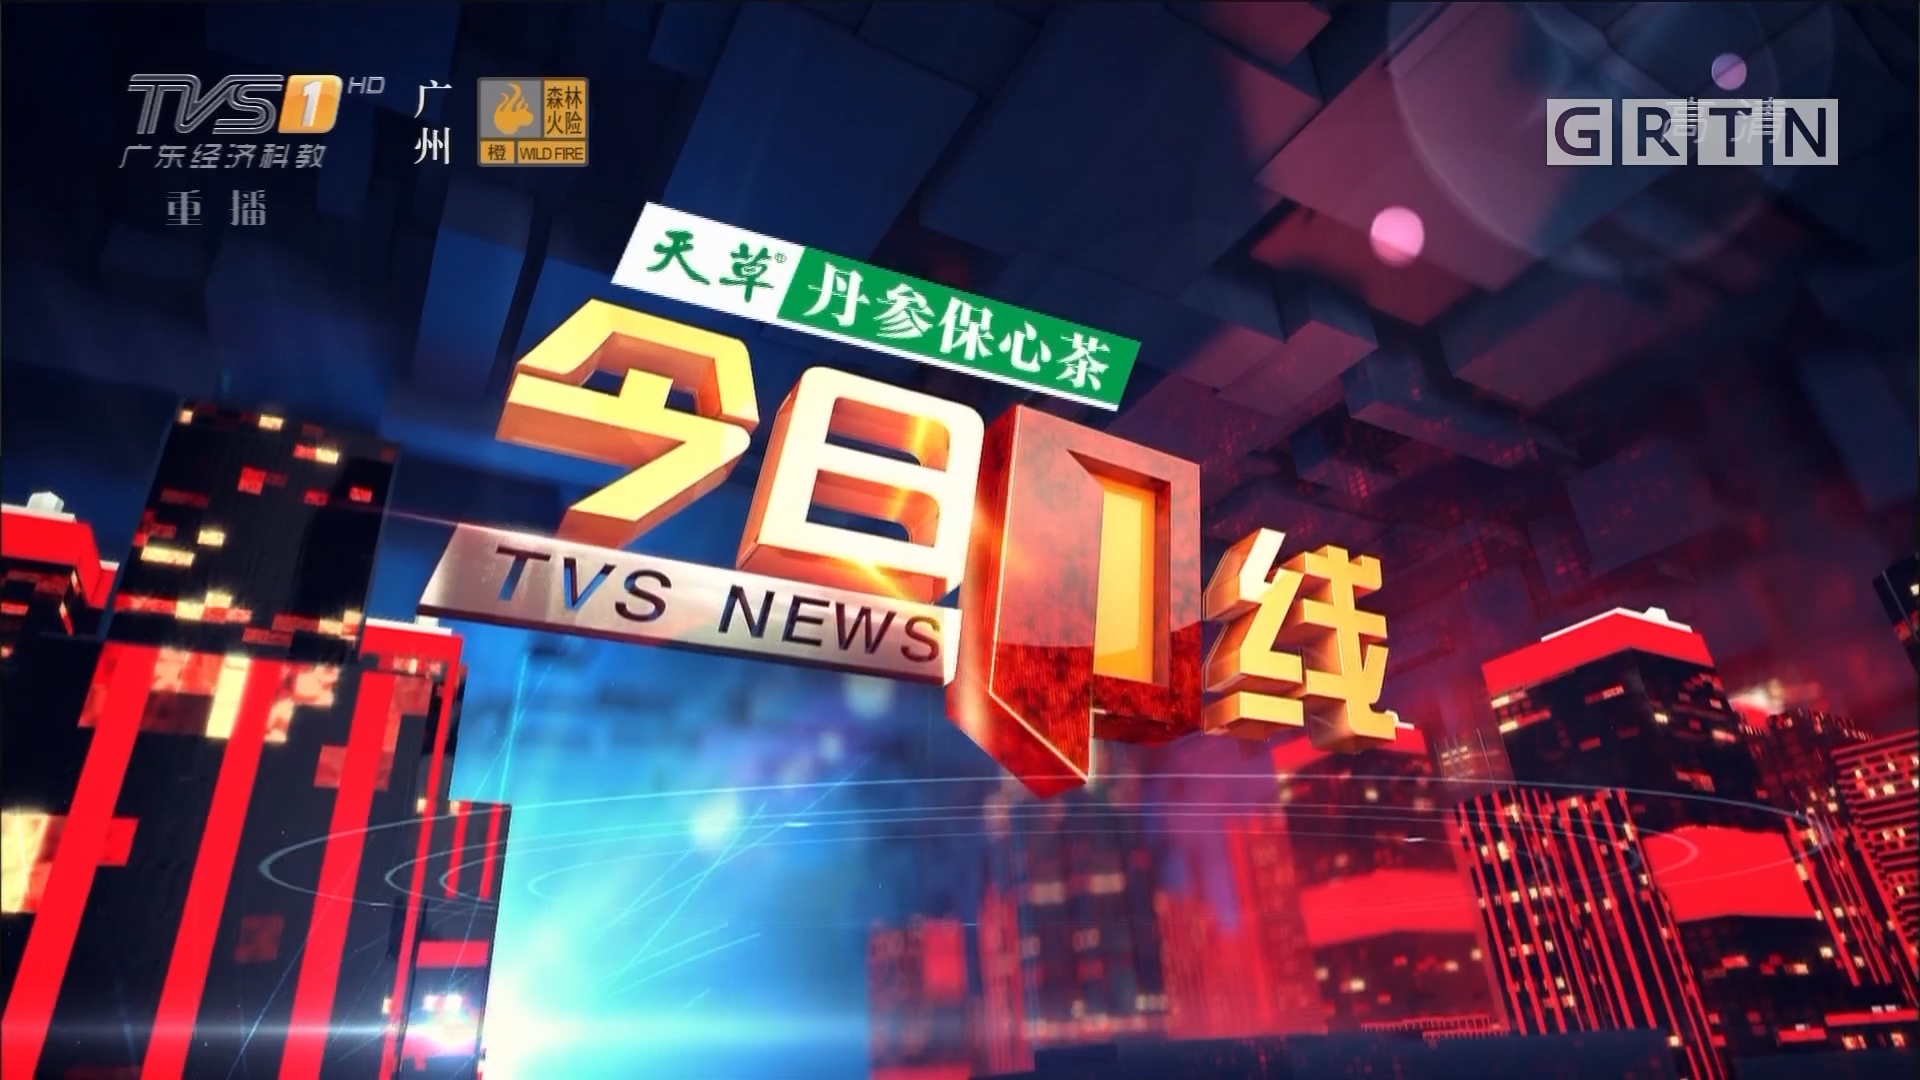 [HD][2019-02-01]今日一线:4G连线:广州海心沙 广州过年花城看花 启动仪式今晚举行